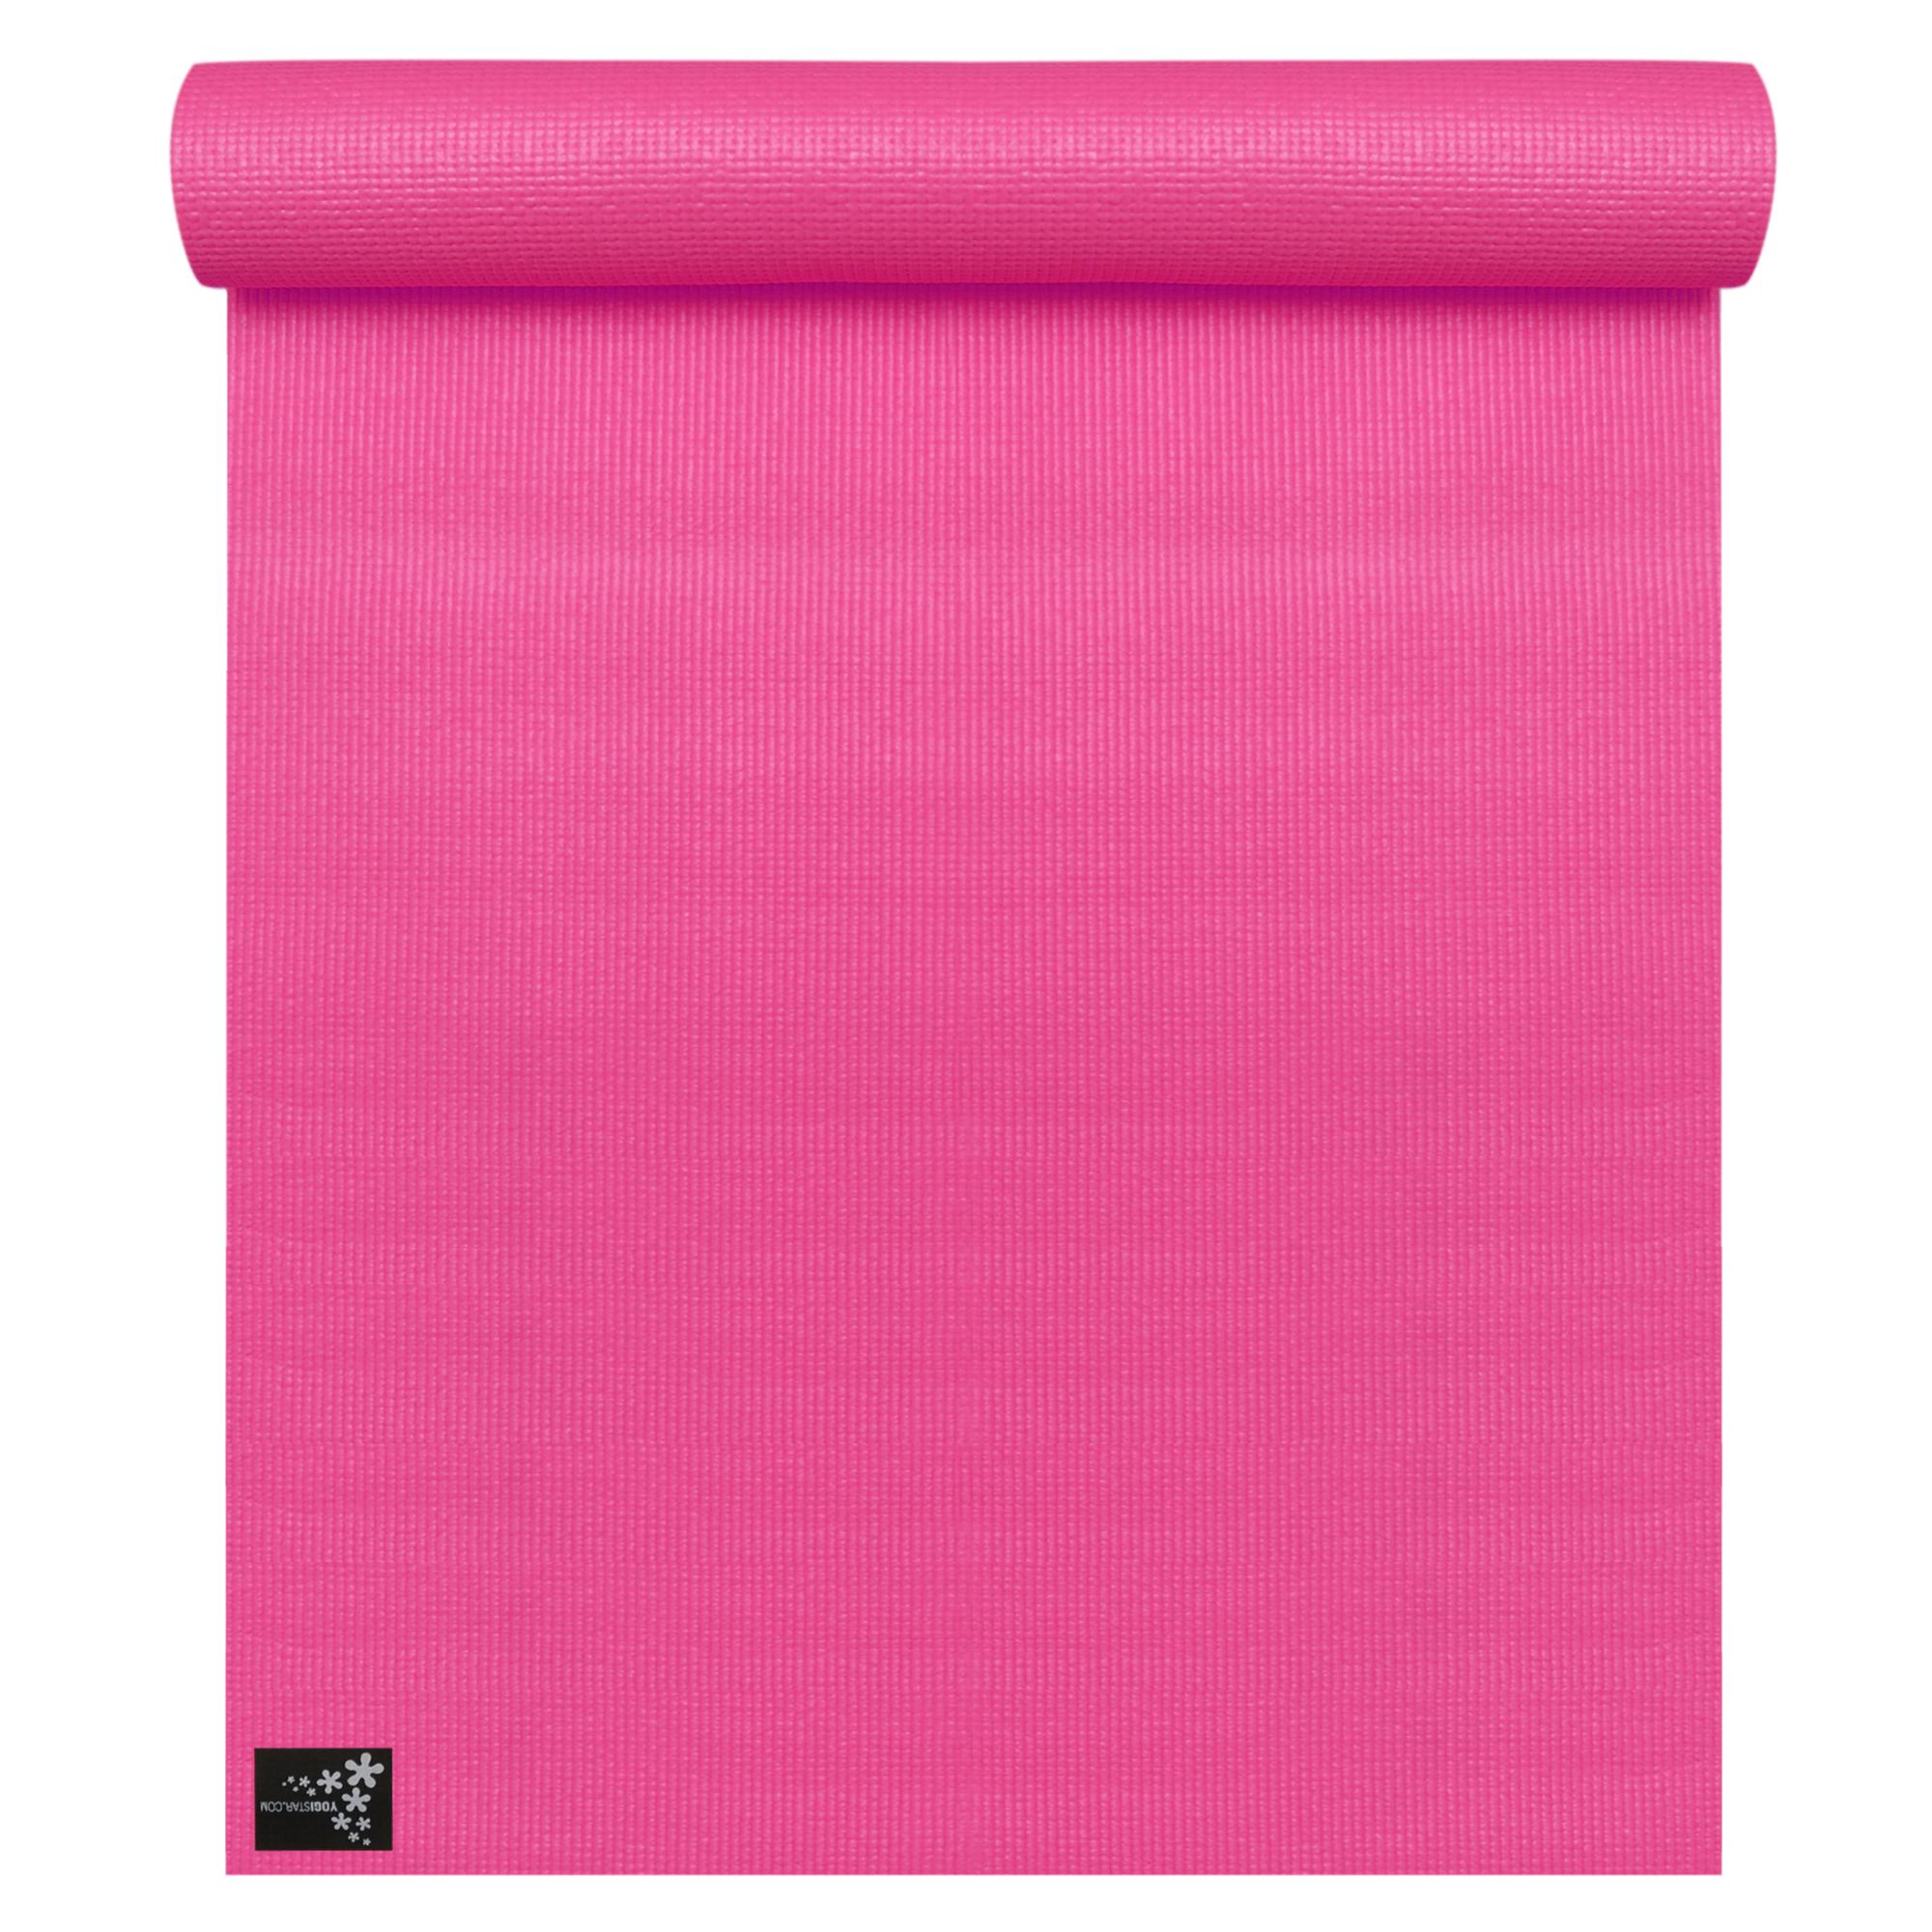 2 wahl yogamatte yogimat� basic pink im yogistar com kaufen2 wahl yogamatte yogimat� basic pink